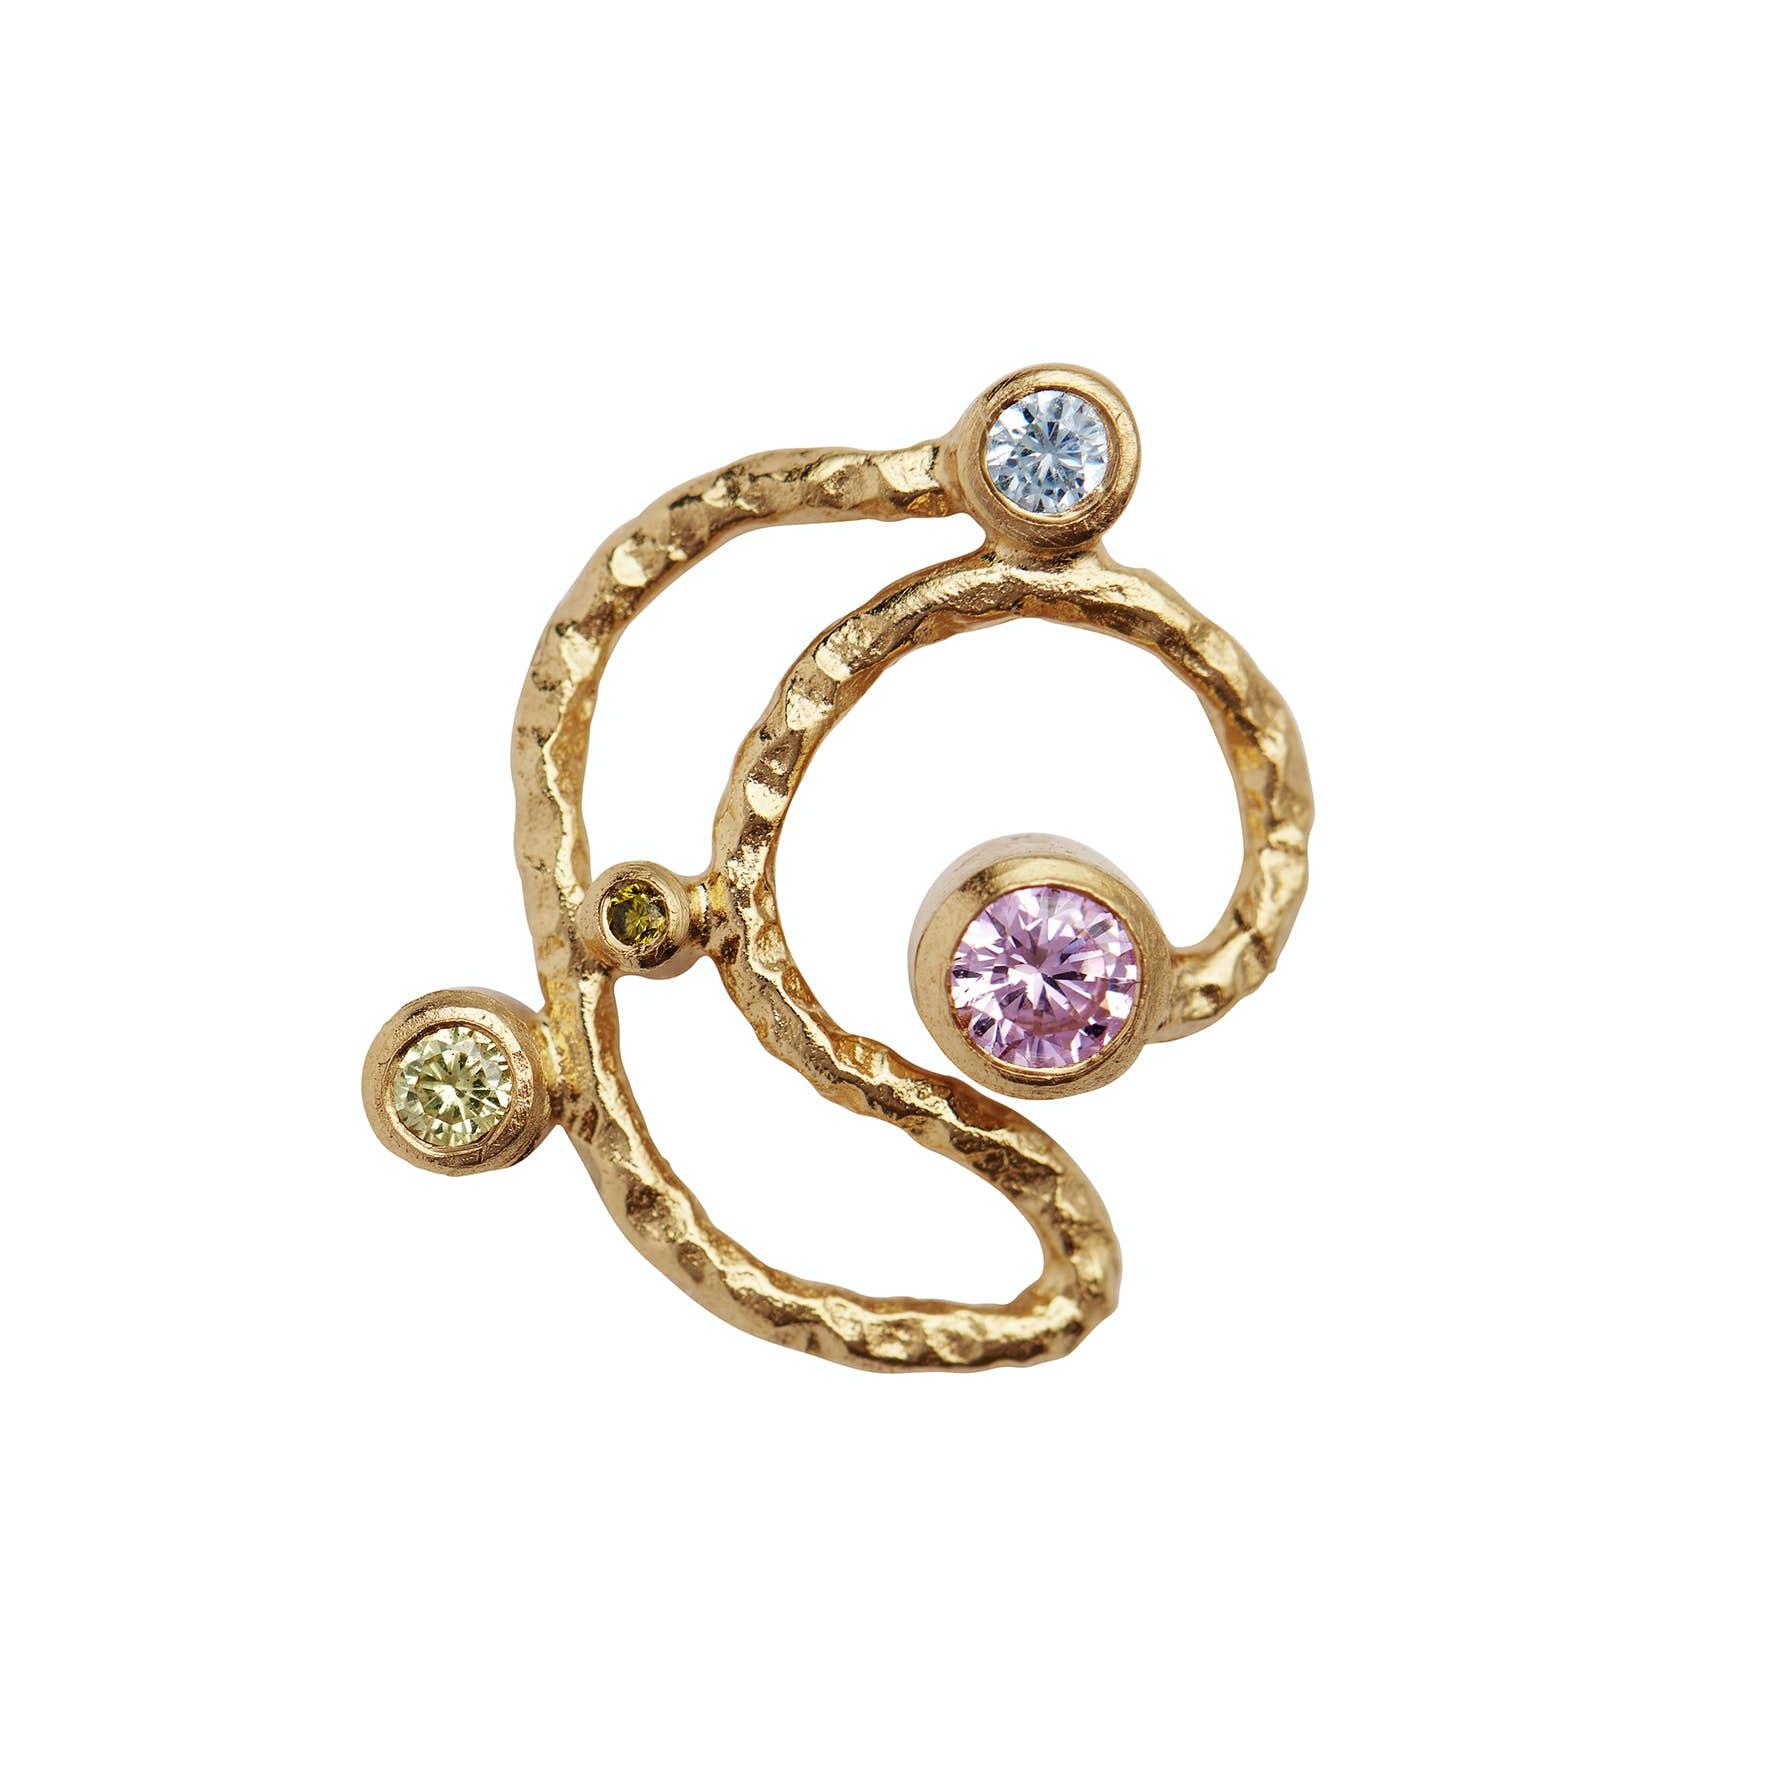 Twirly Candy Dots Earstick von STINE A Jewelry in Vergoldet-Silber Sterling 925